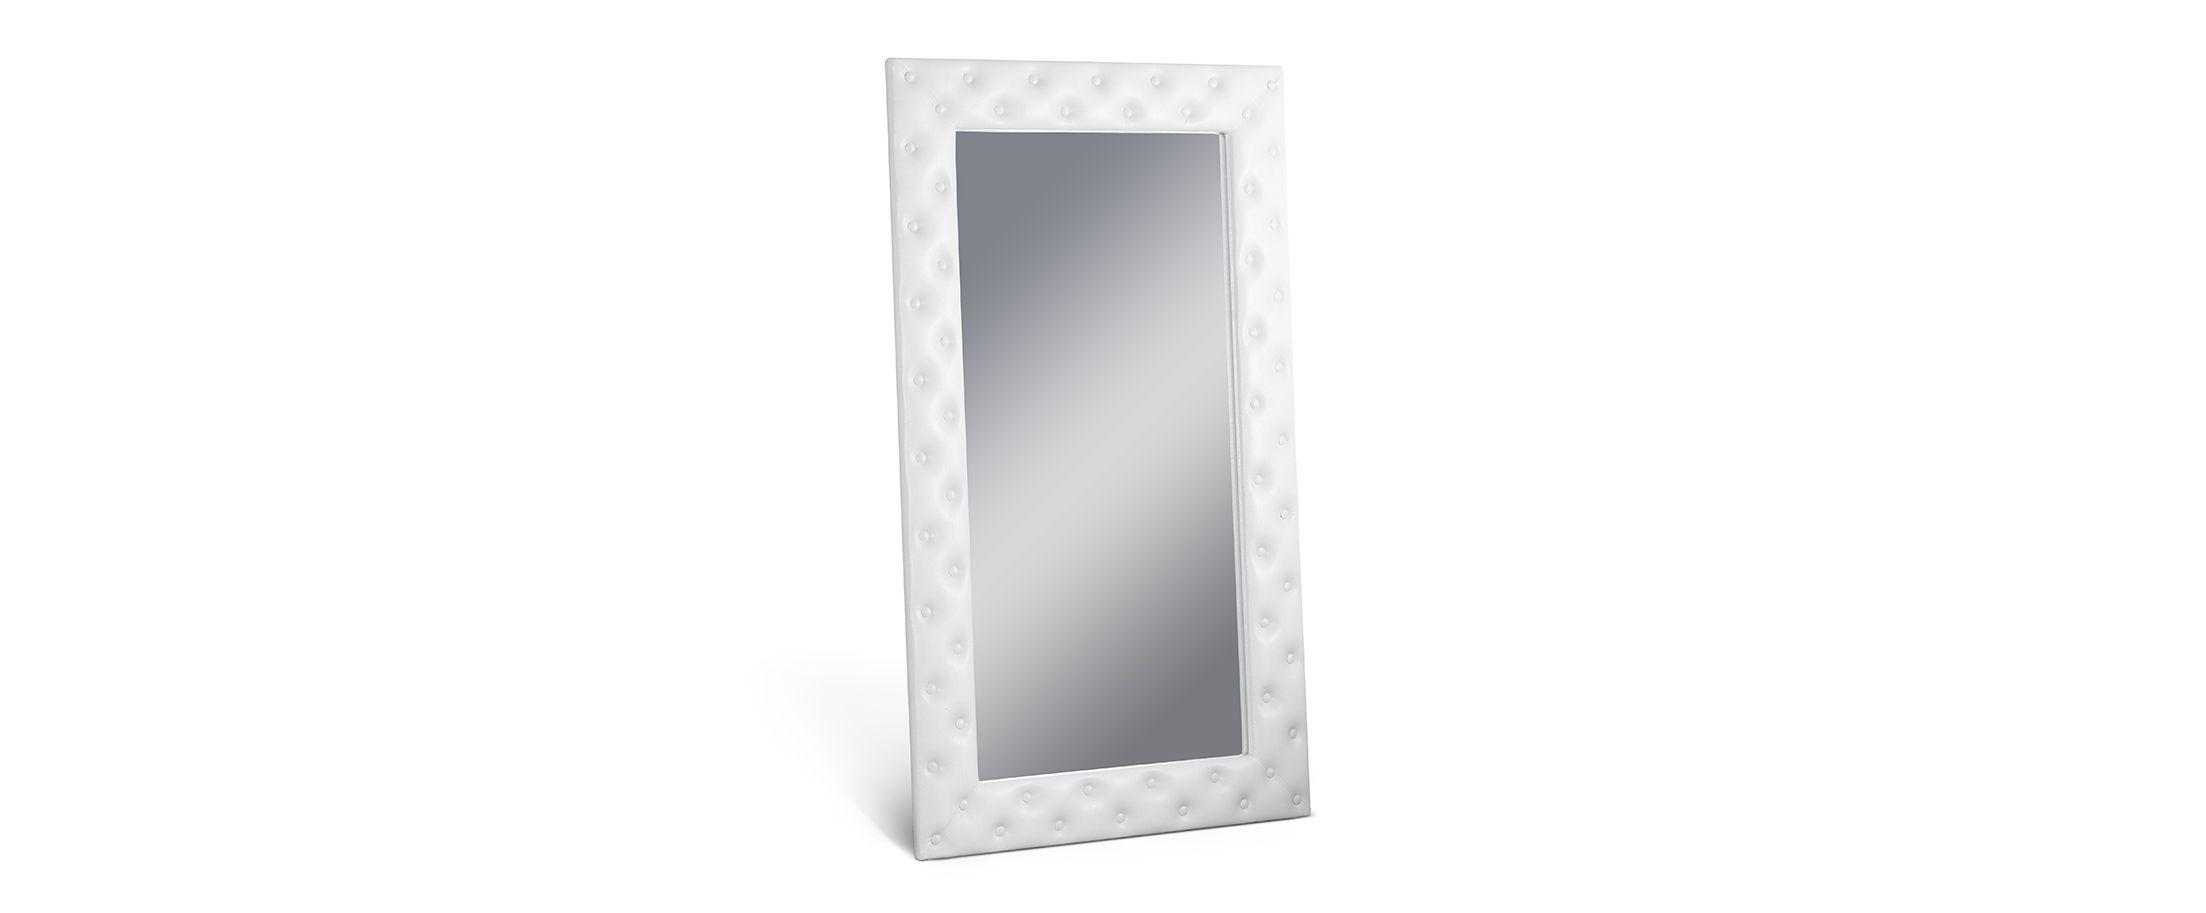 Зеркало Кааба большое с пуговицами марципан от MOON TRADE